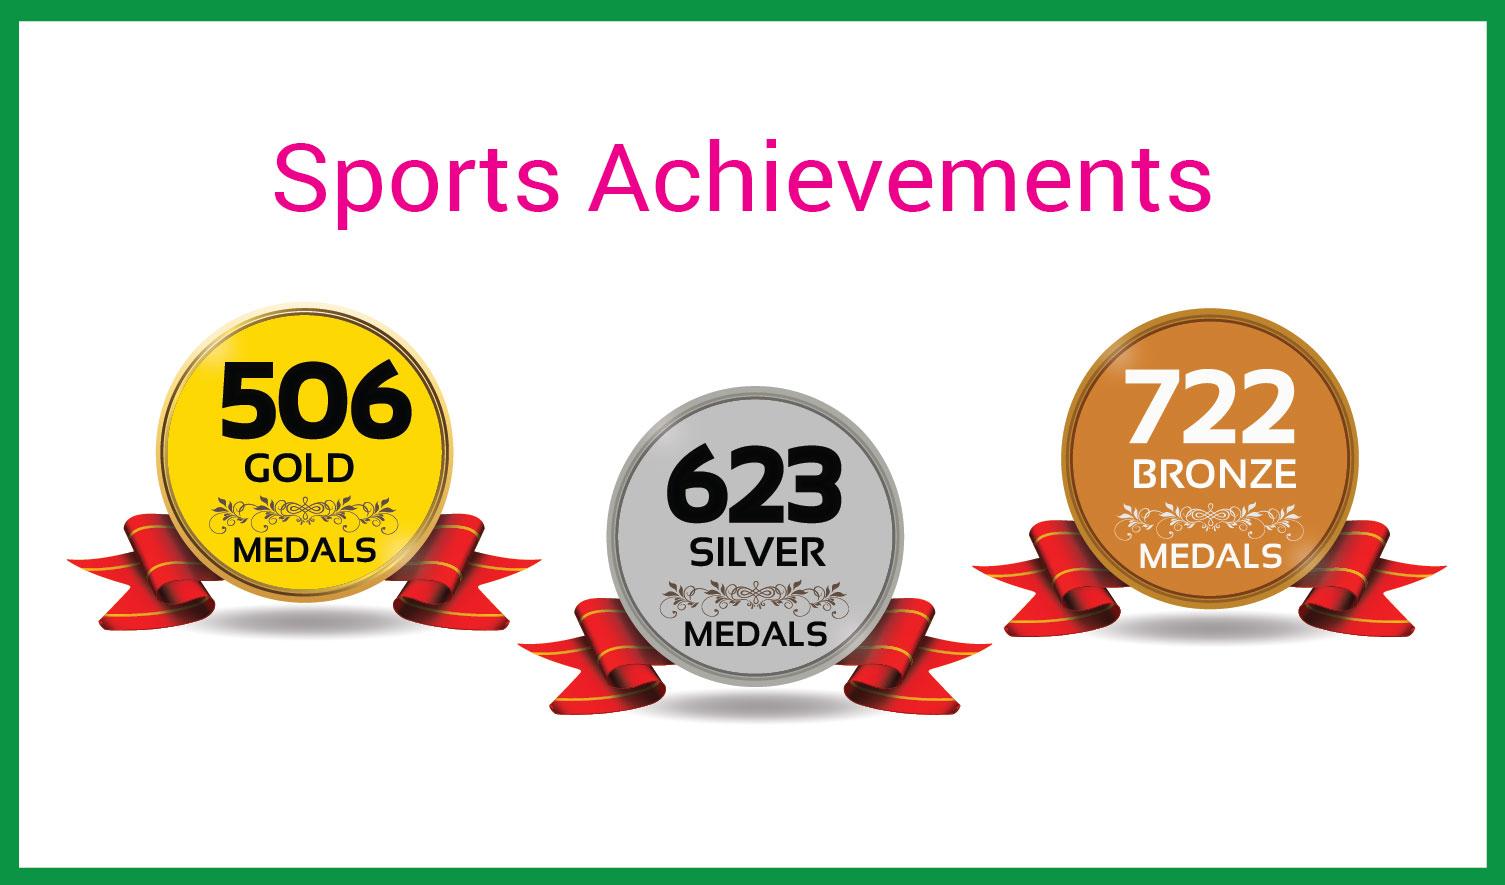 SportsAcheivements16-17